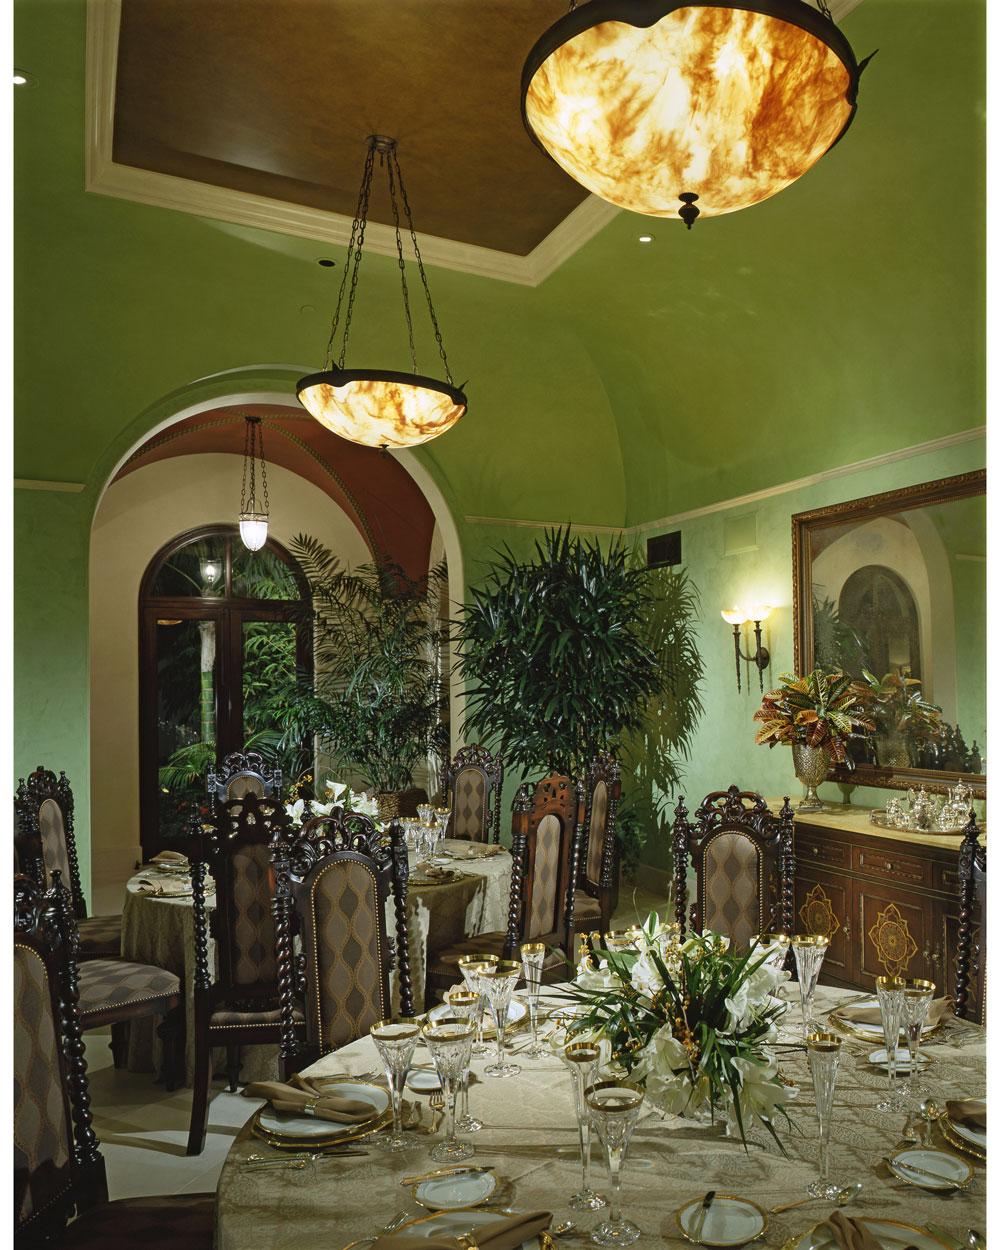 5-Dee-Carawan-dining-room.jpg